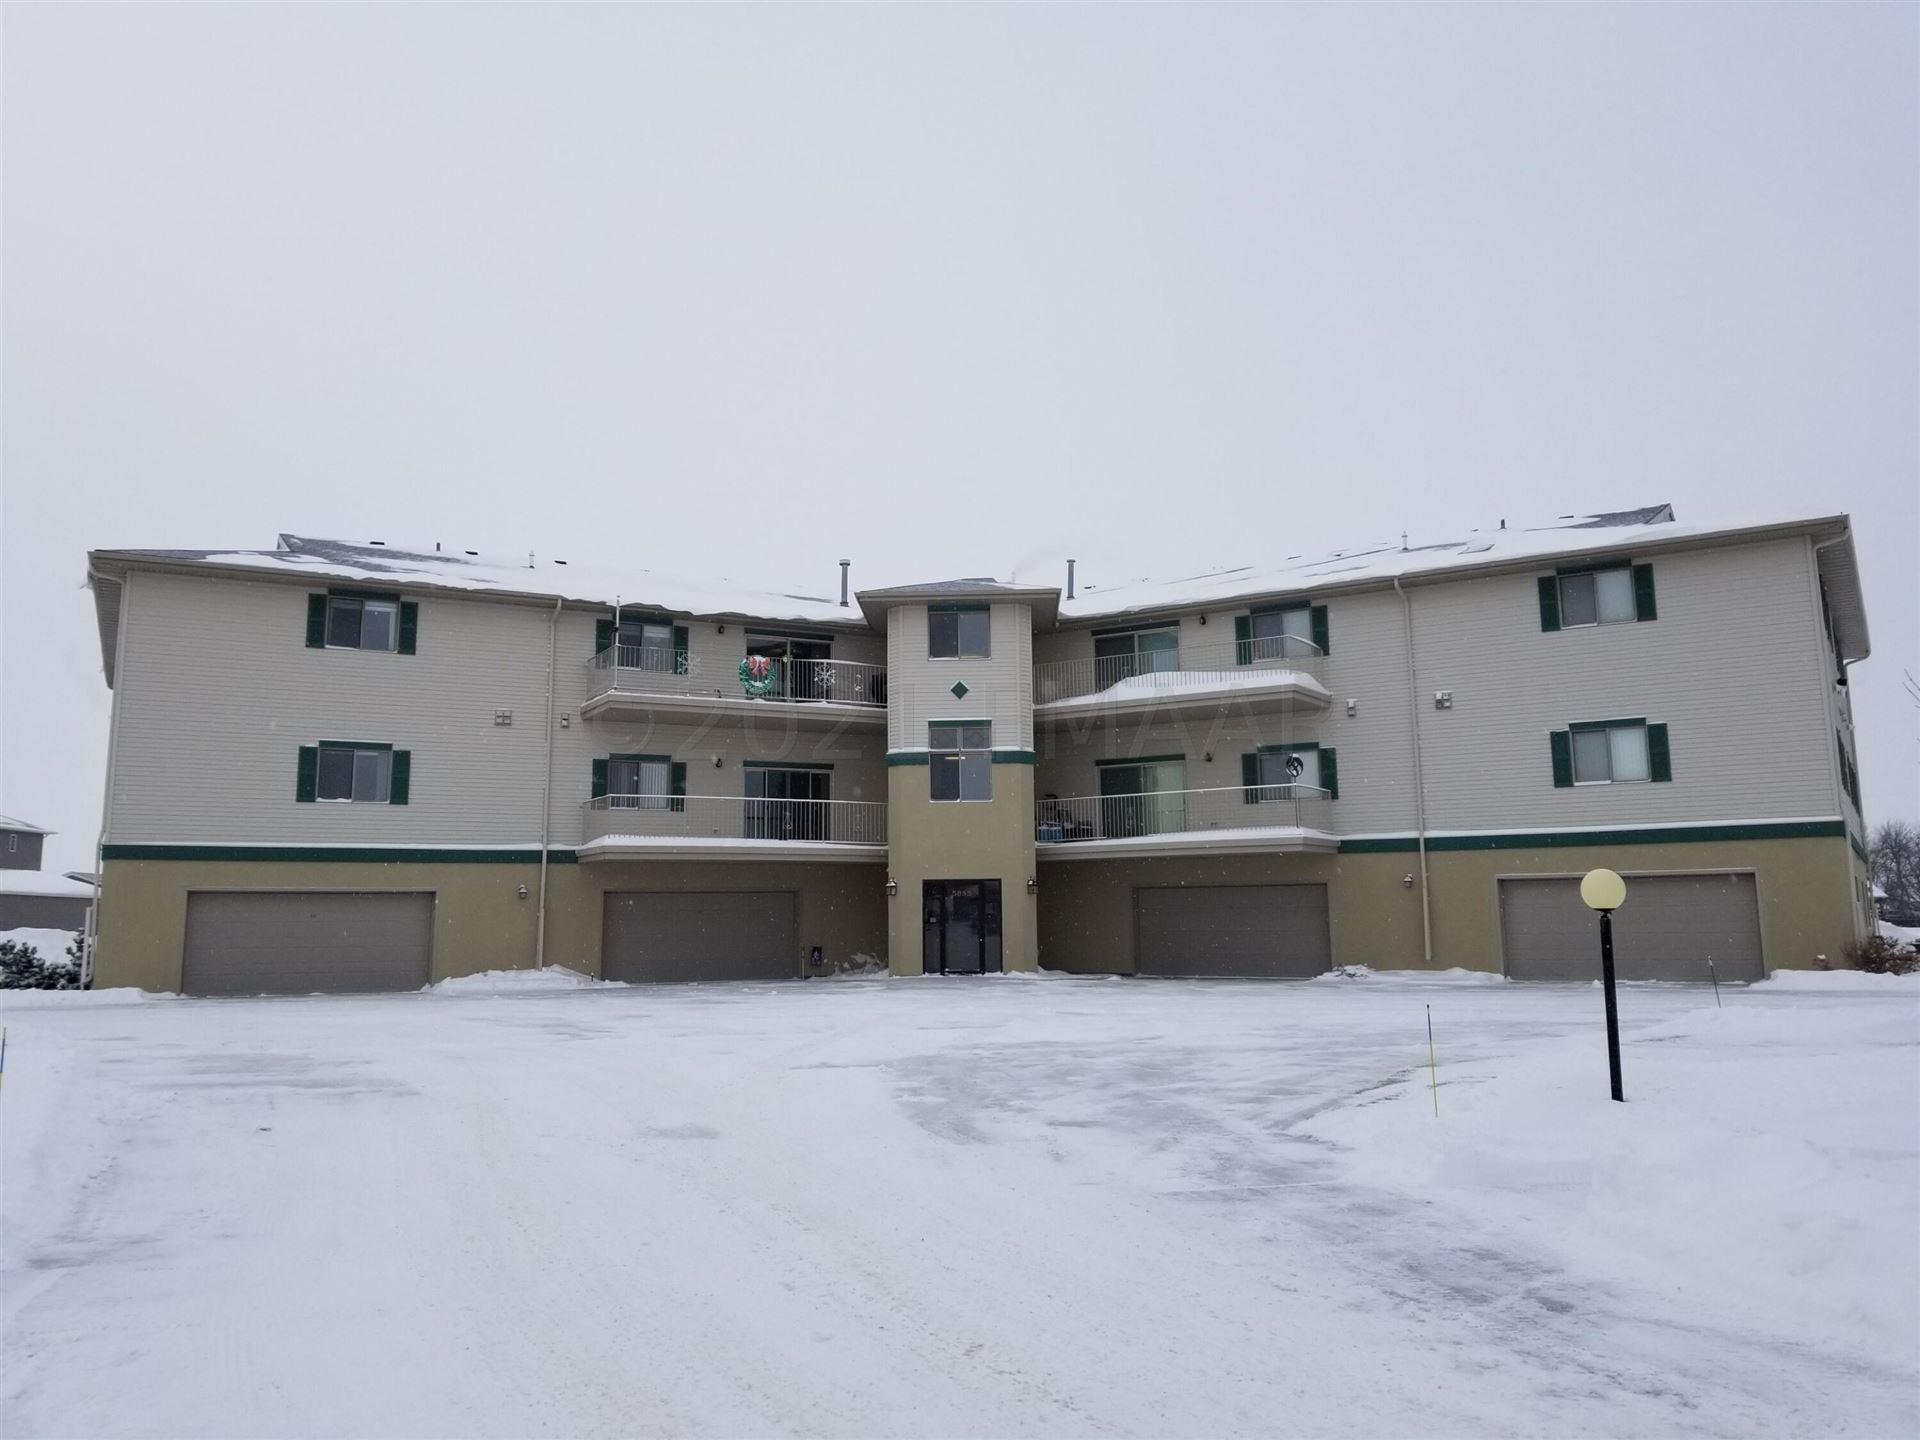 5855 24 Street S #UNIT 201, Fargo, ND 58104 - #: 21-4465